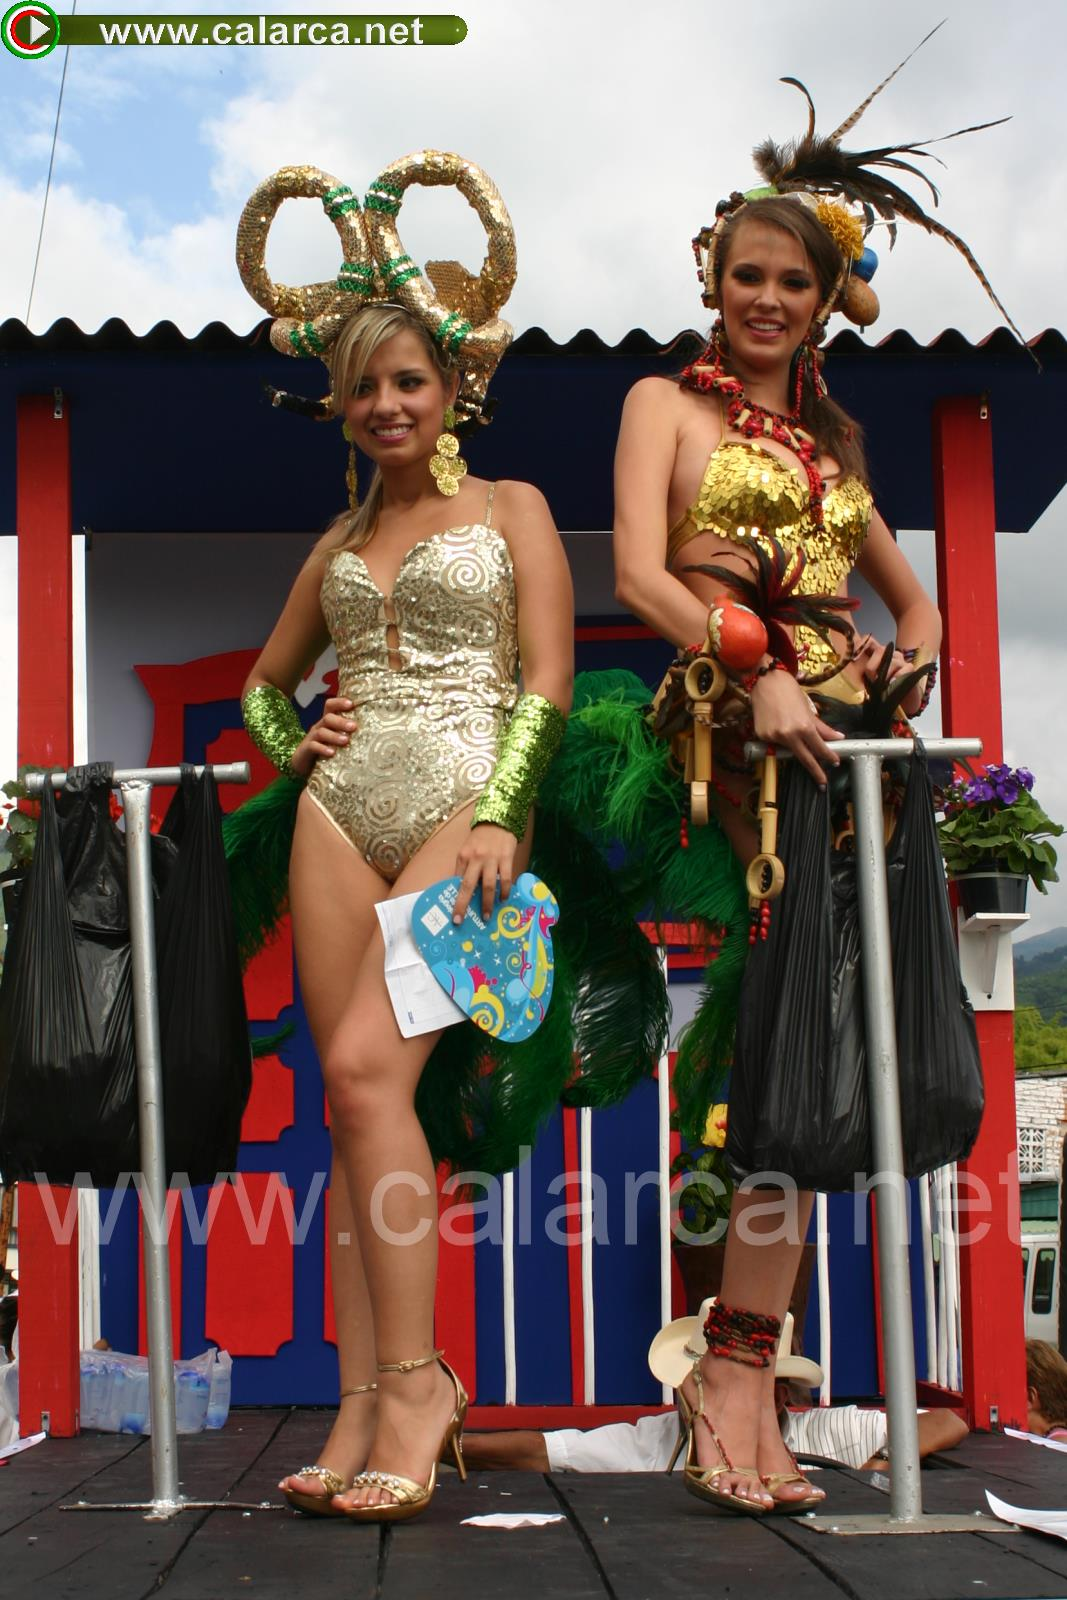 Huila - Suad Rujana Salas; Quindío - Karen Lizeth Gutiérrez González